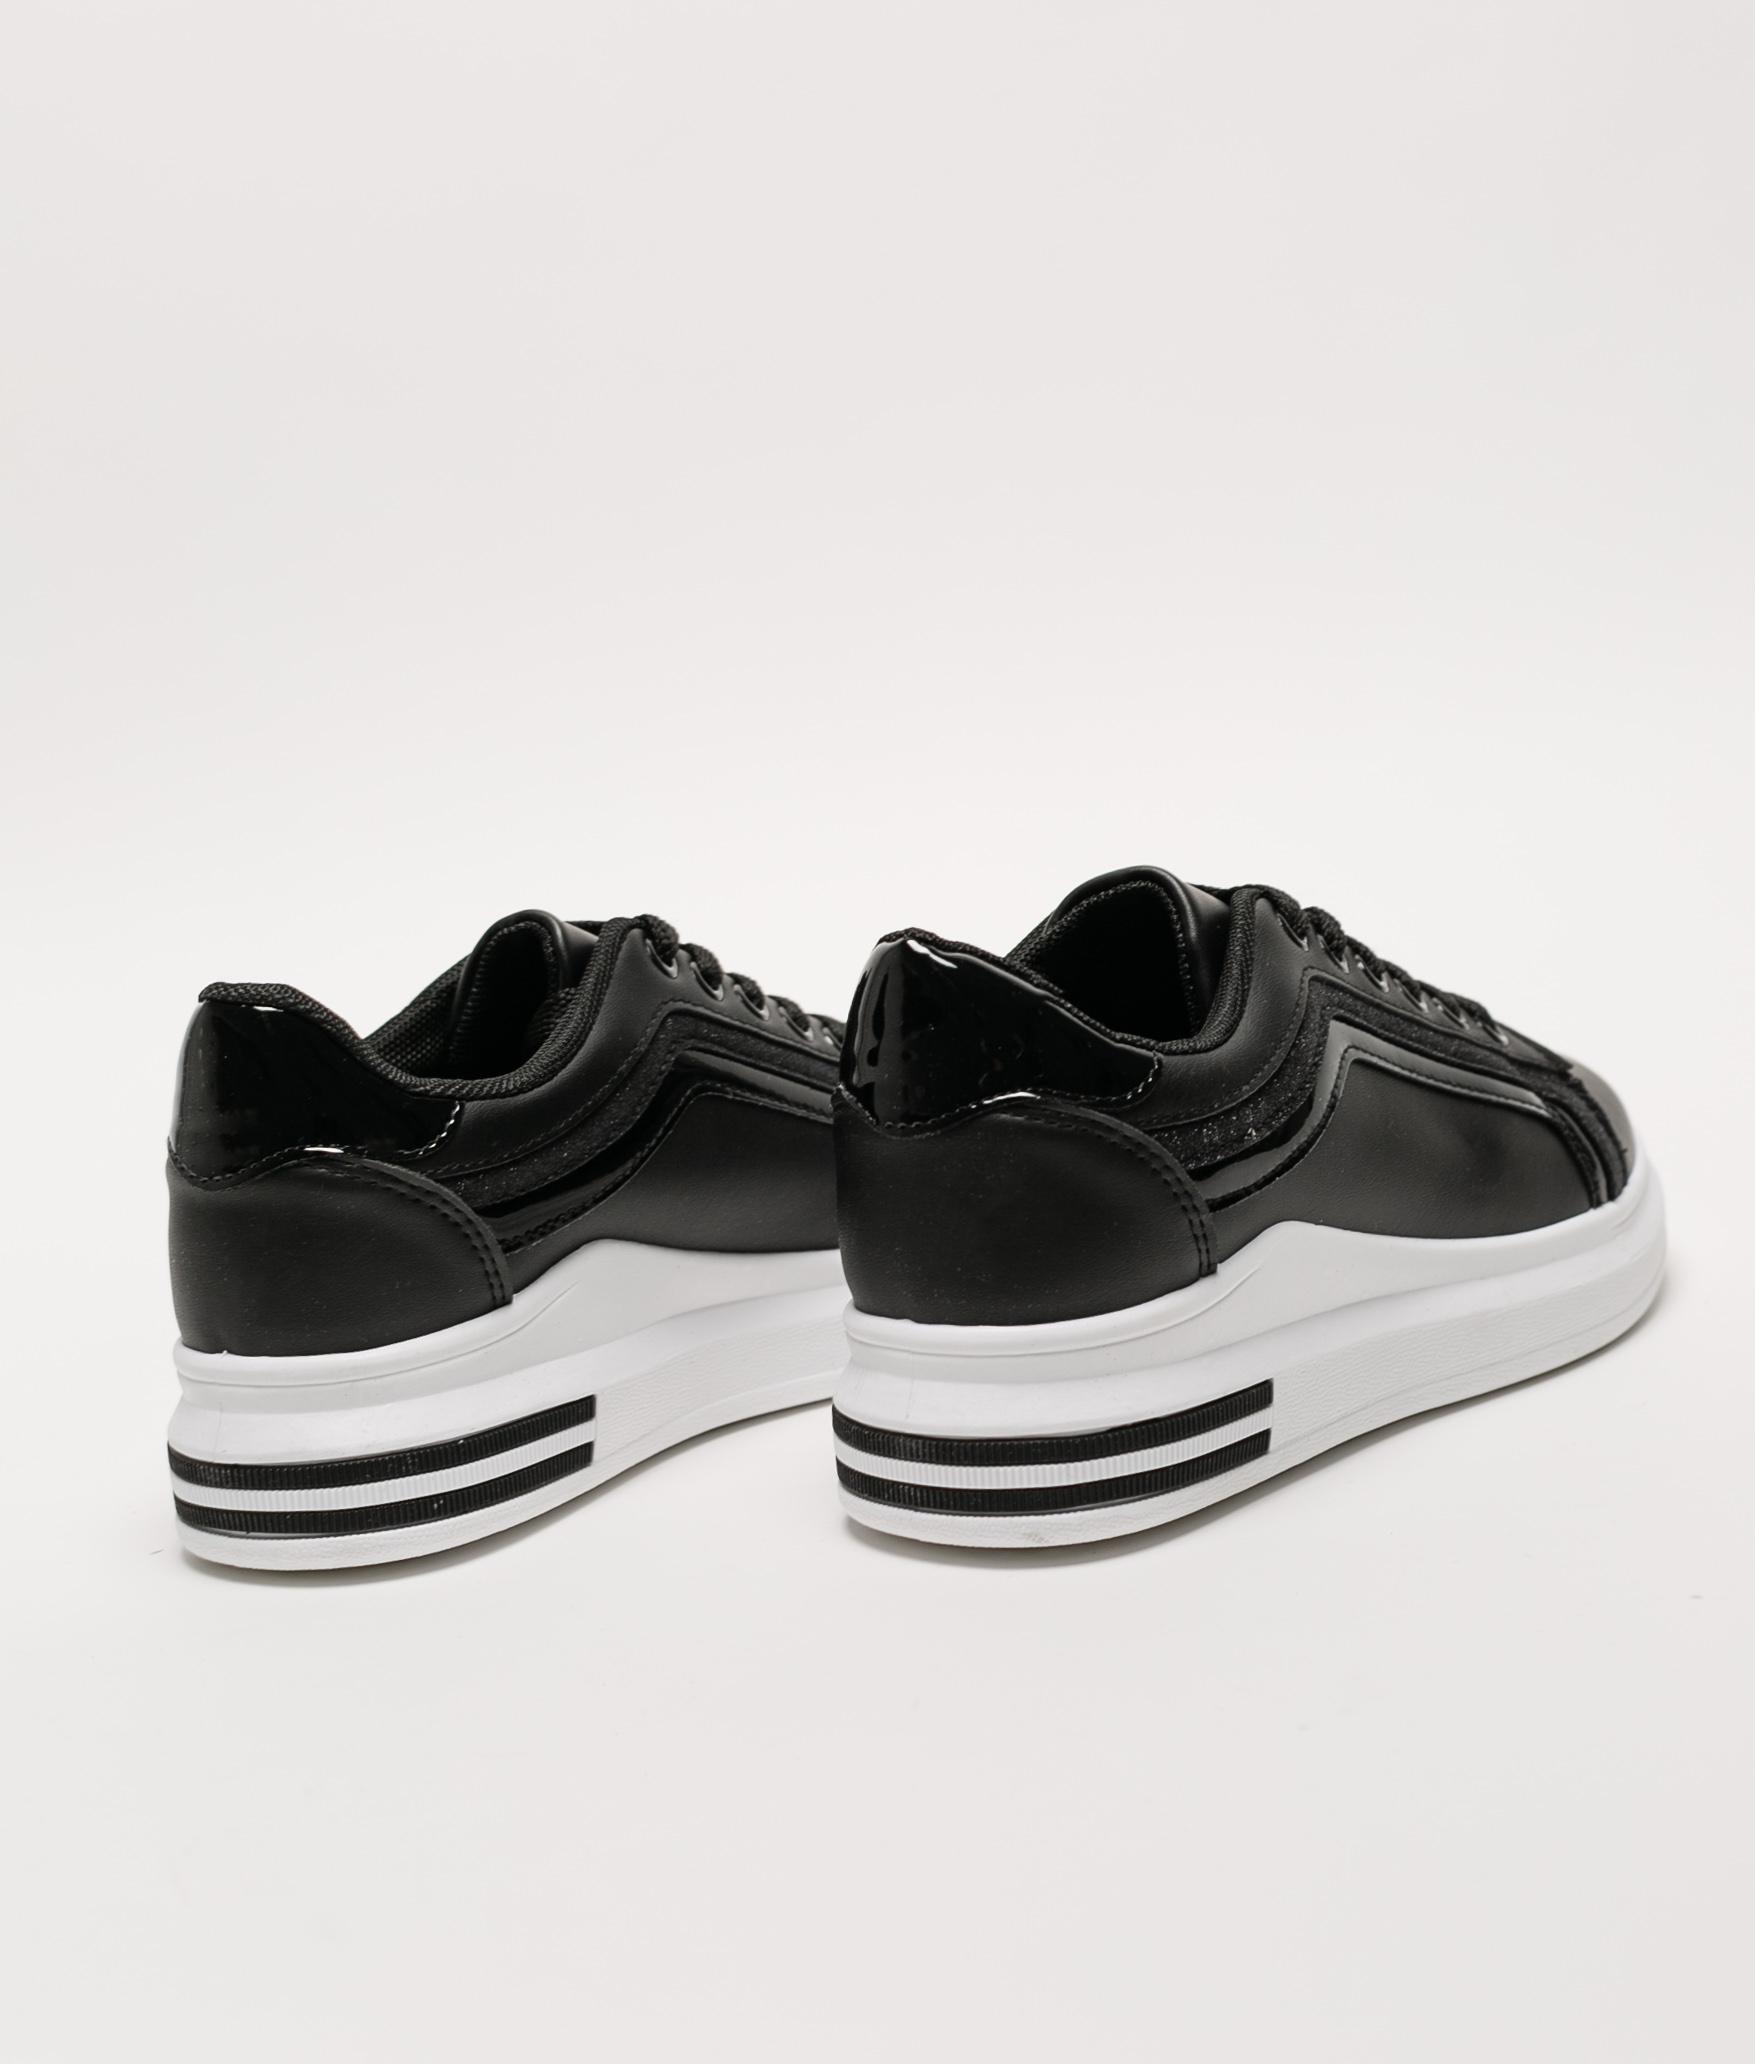 Sneakers LUPI - Noir